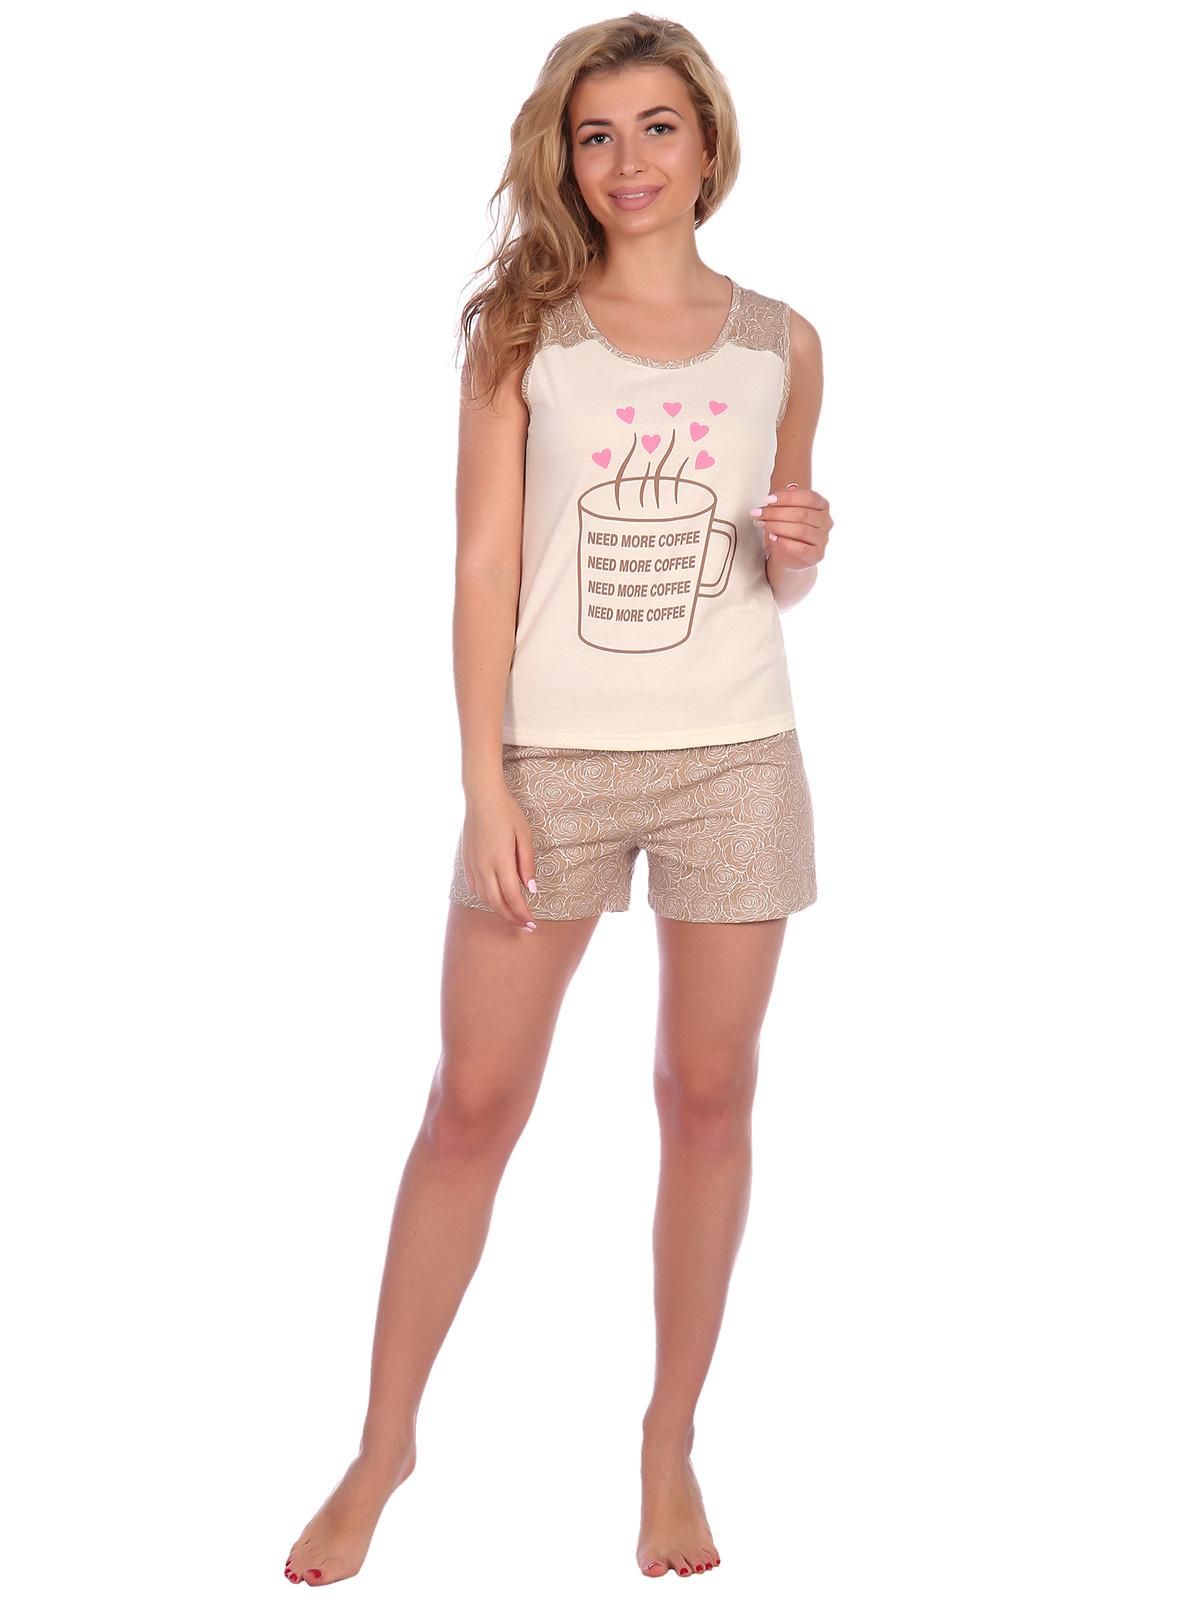 Жен. пижама арт. 16-0574 Бежевый р. 42 НСД Трикотаж